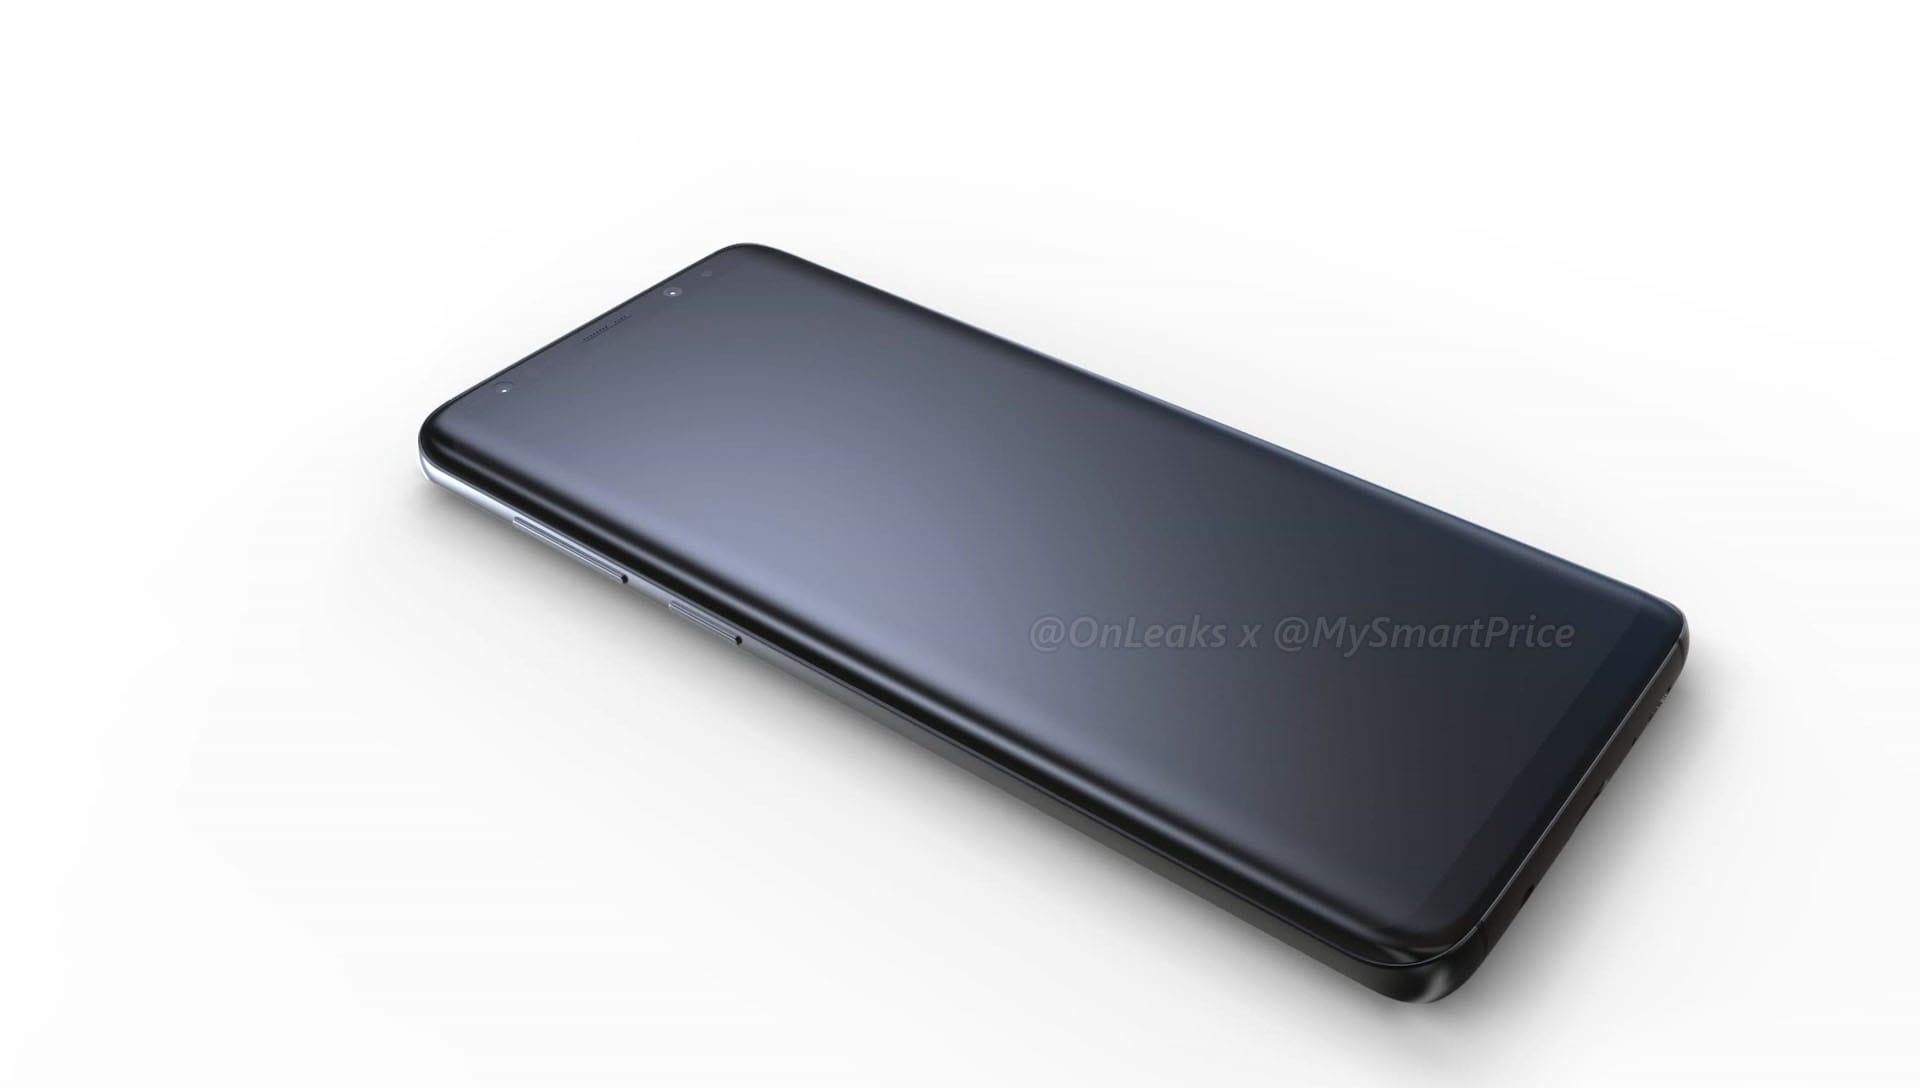 Самсунг представит Galaxy S9 иS9+ навыставке MWC 26февраля